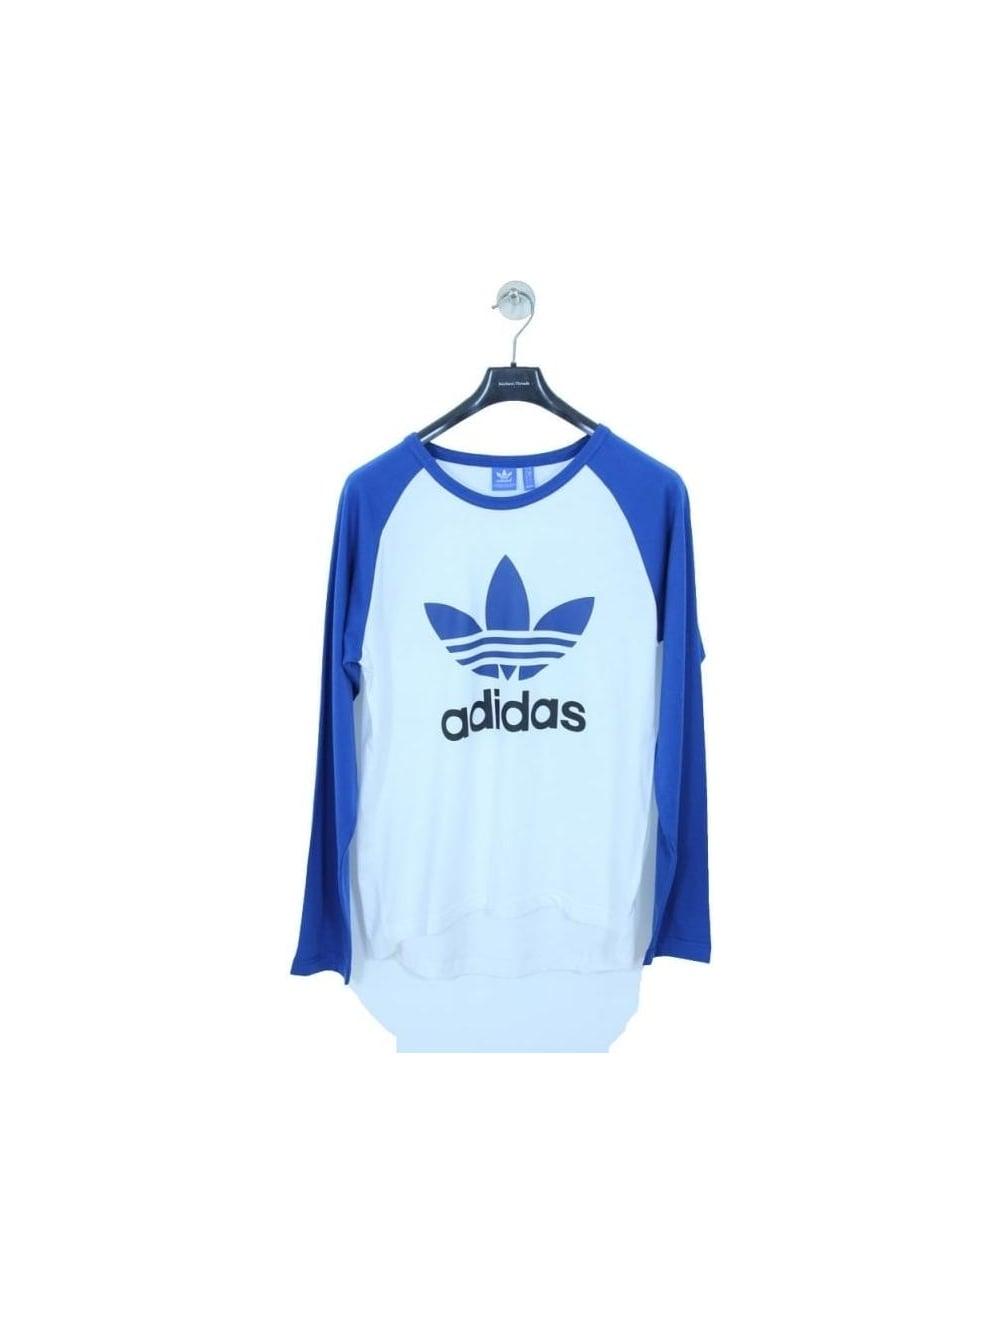 Adidas Originals Trefoil Long Sleeved T Shirt In White